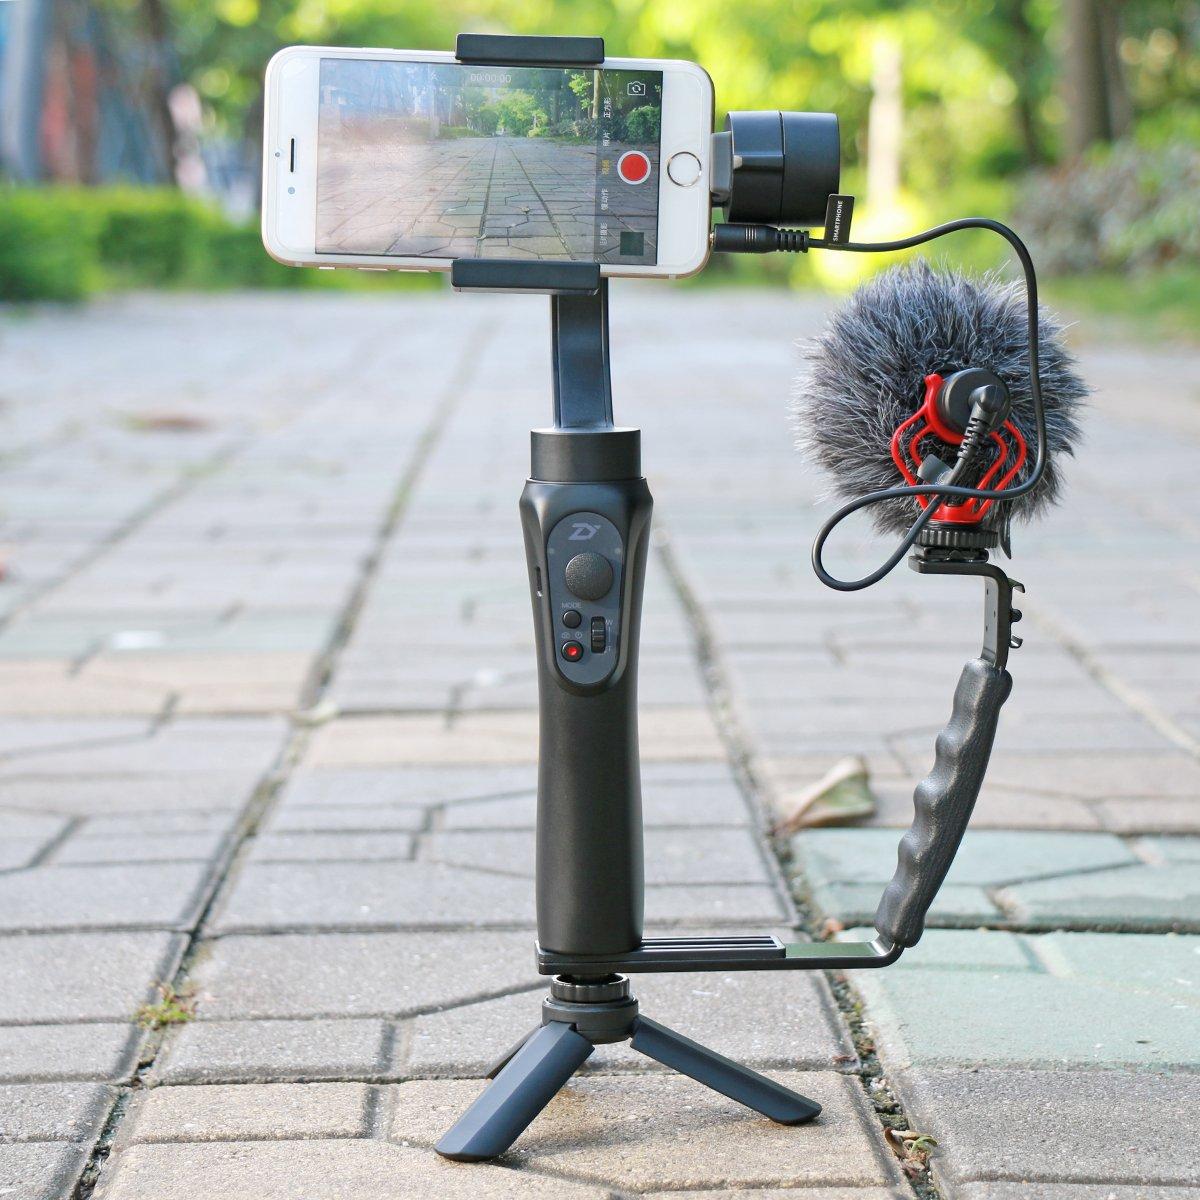 Ulanzi L Mic Stand Mini Tripod Set Heavy Duty Combo Boya By Mm1 Dan M1 Photography Bracket With 2 Standard Flash Hot Shoe Mounts For Dji Osmo Mobile